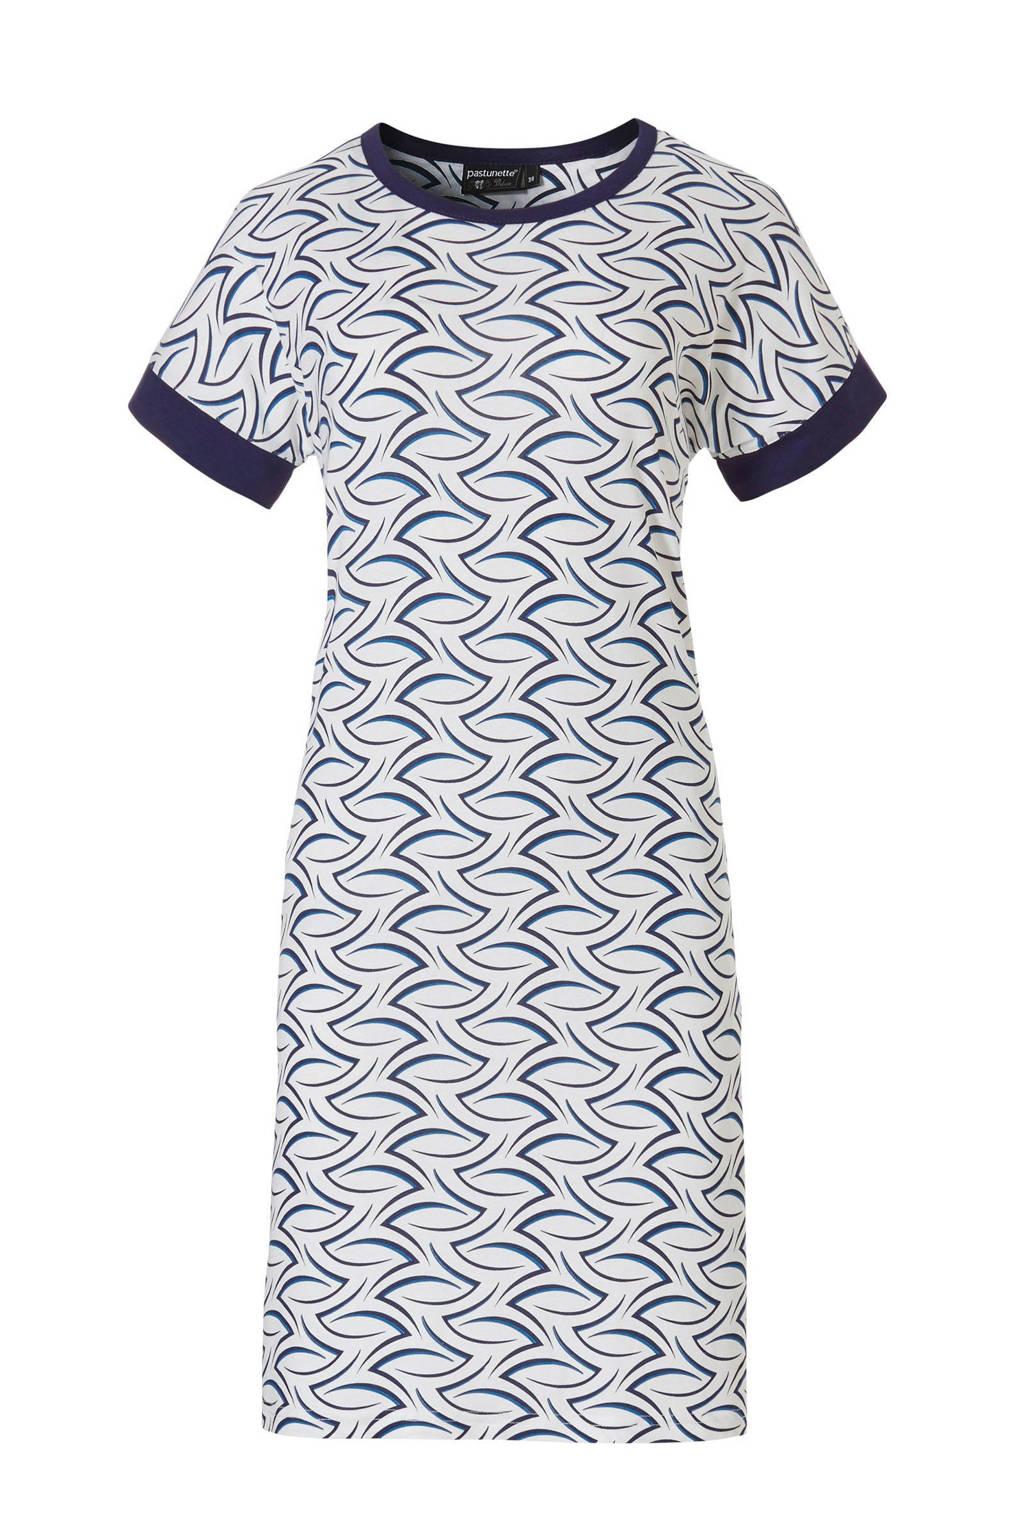 Pastunette Deluxe nachthemd met all over print wit/donkerblauw/wit, Wit/donkerblauw/wit